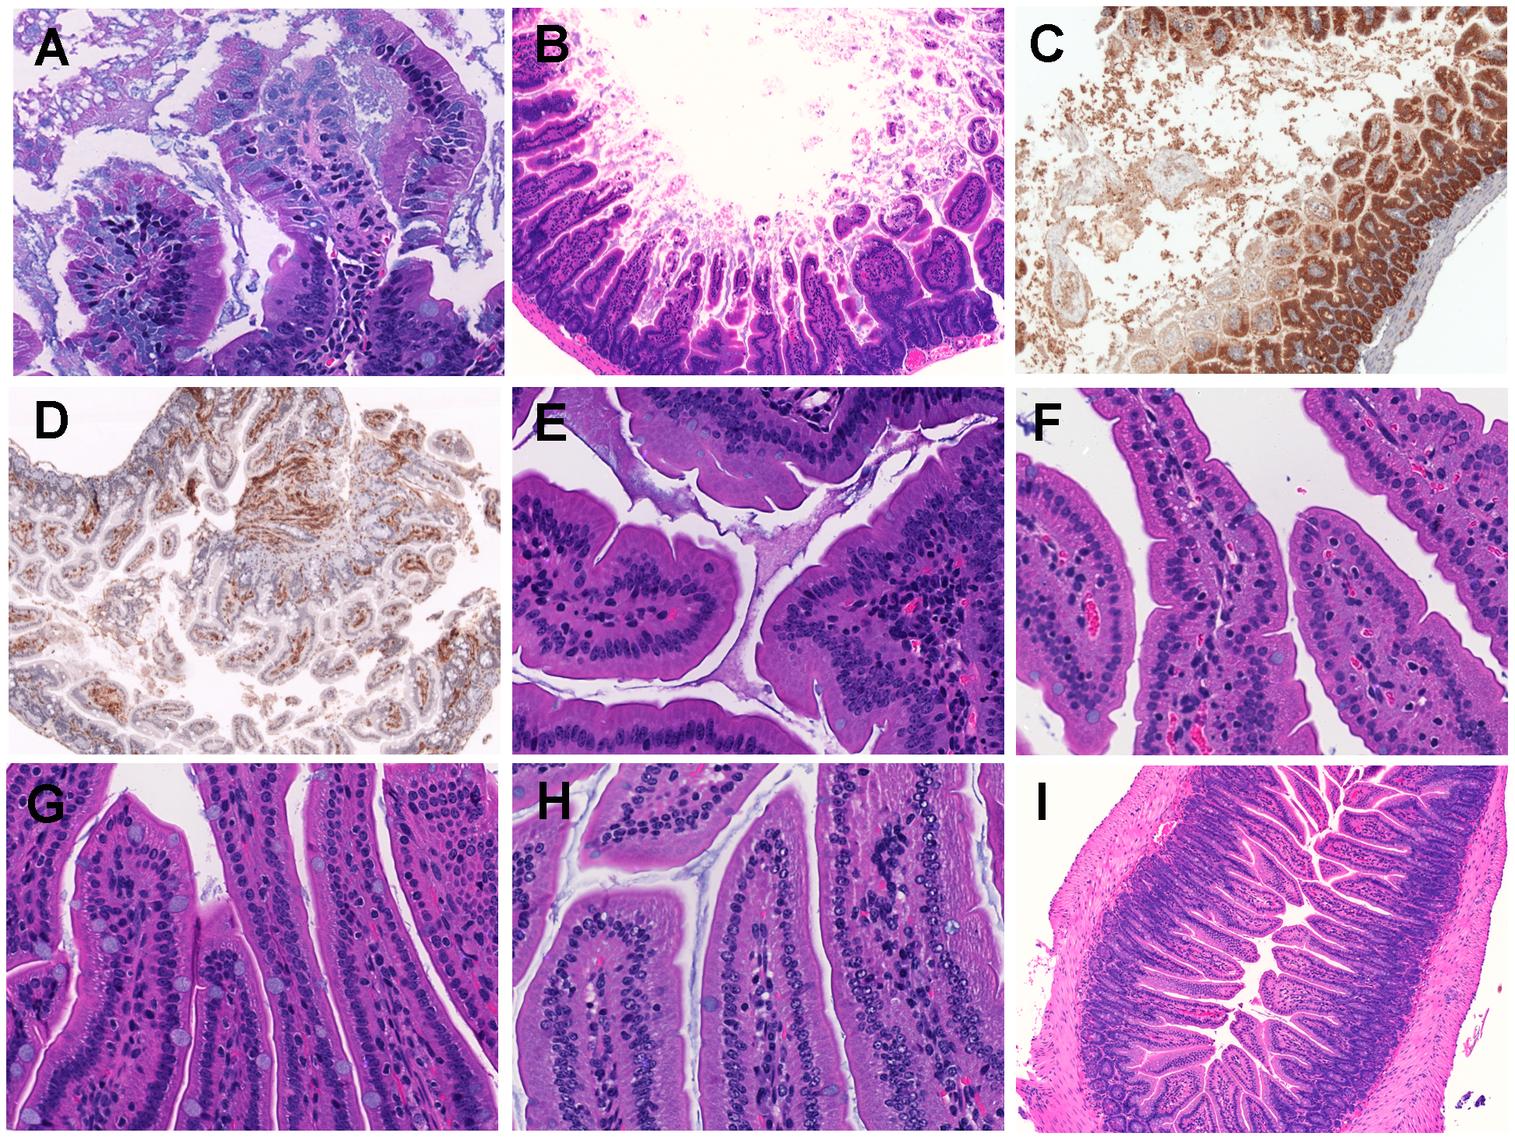 Histopathological examination of mice small intestine inoculated with <i>V. vulnificus</i> strains.